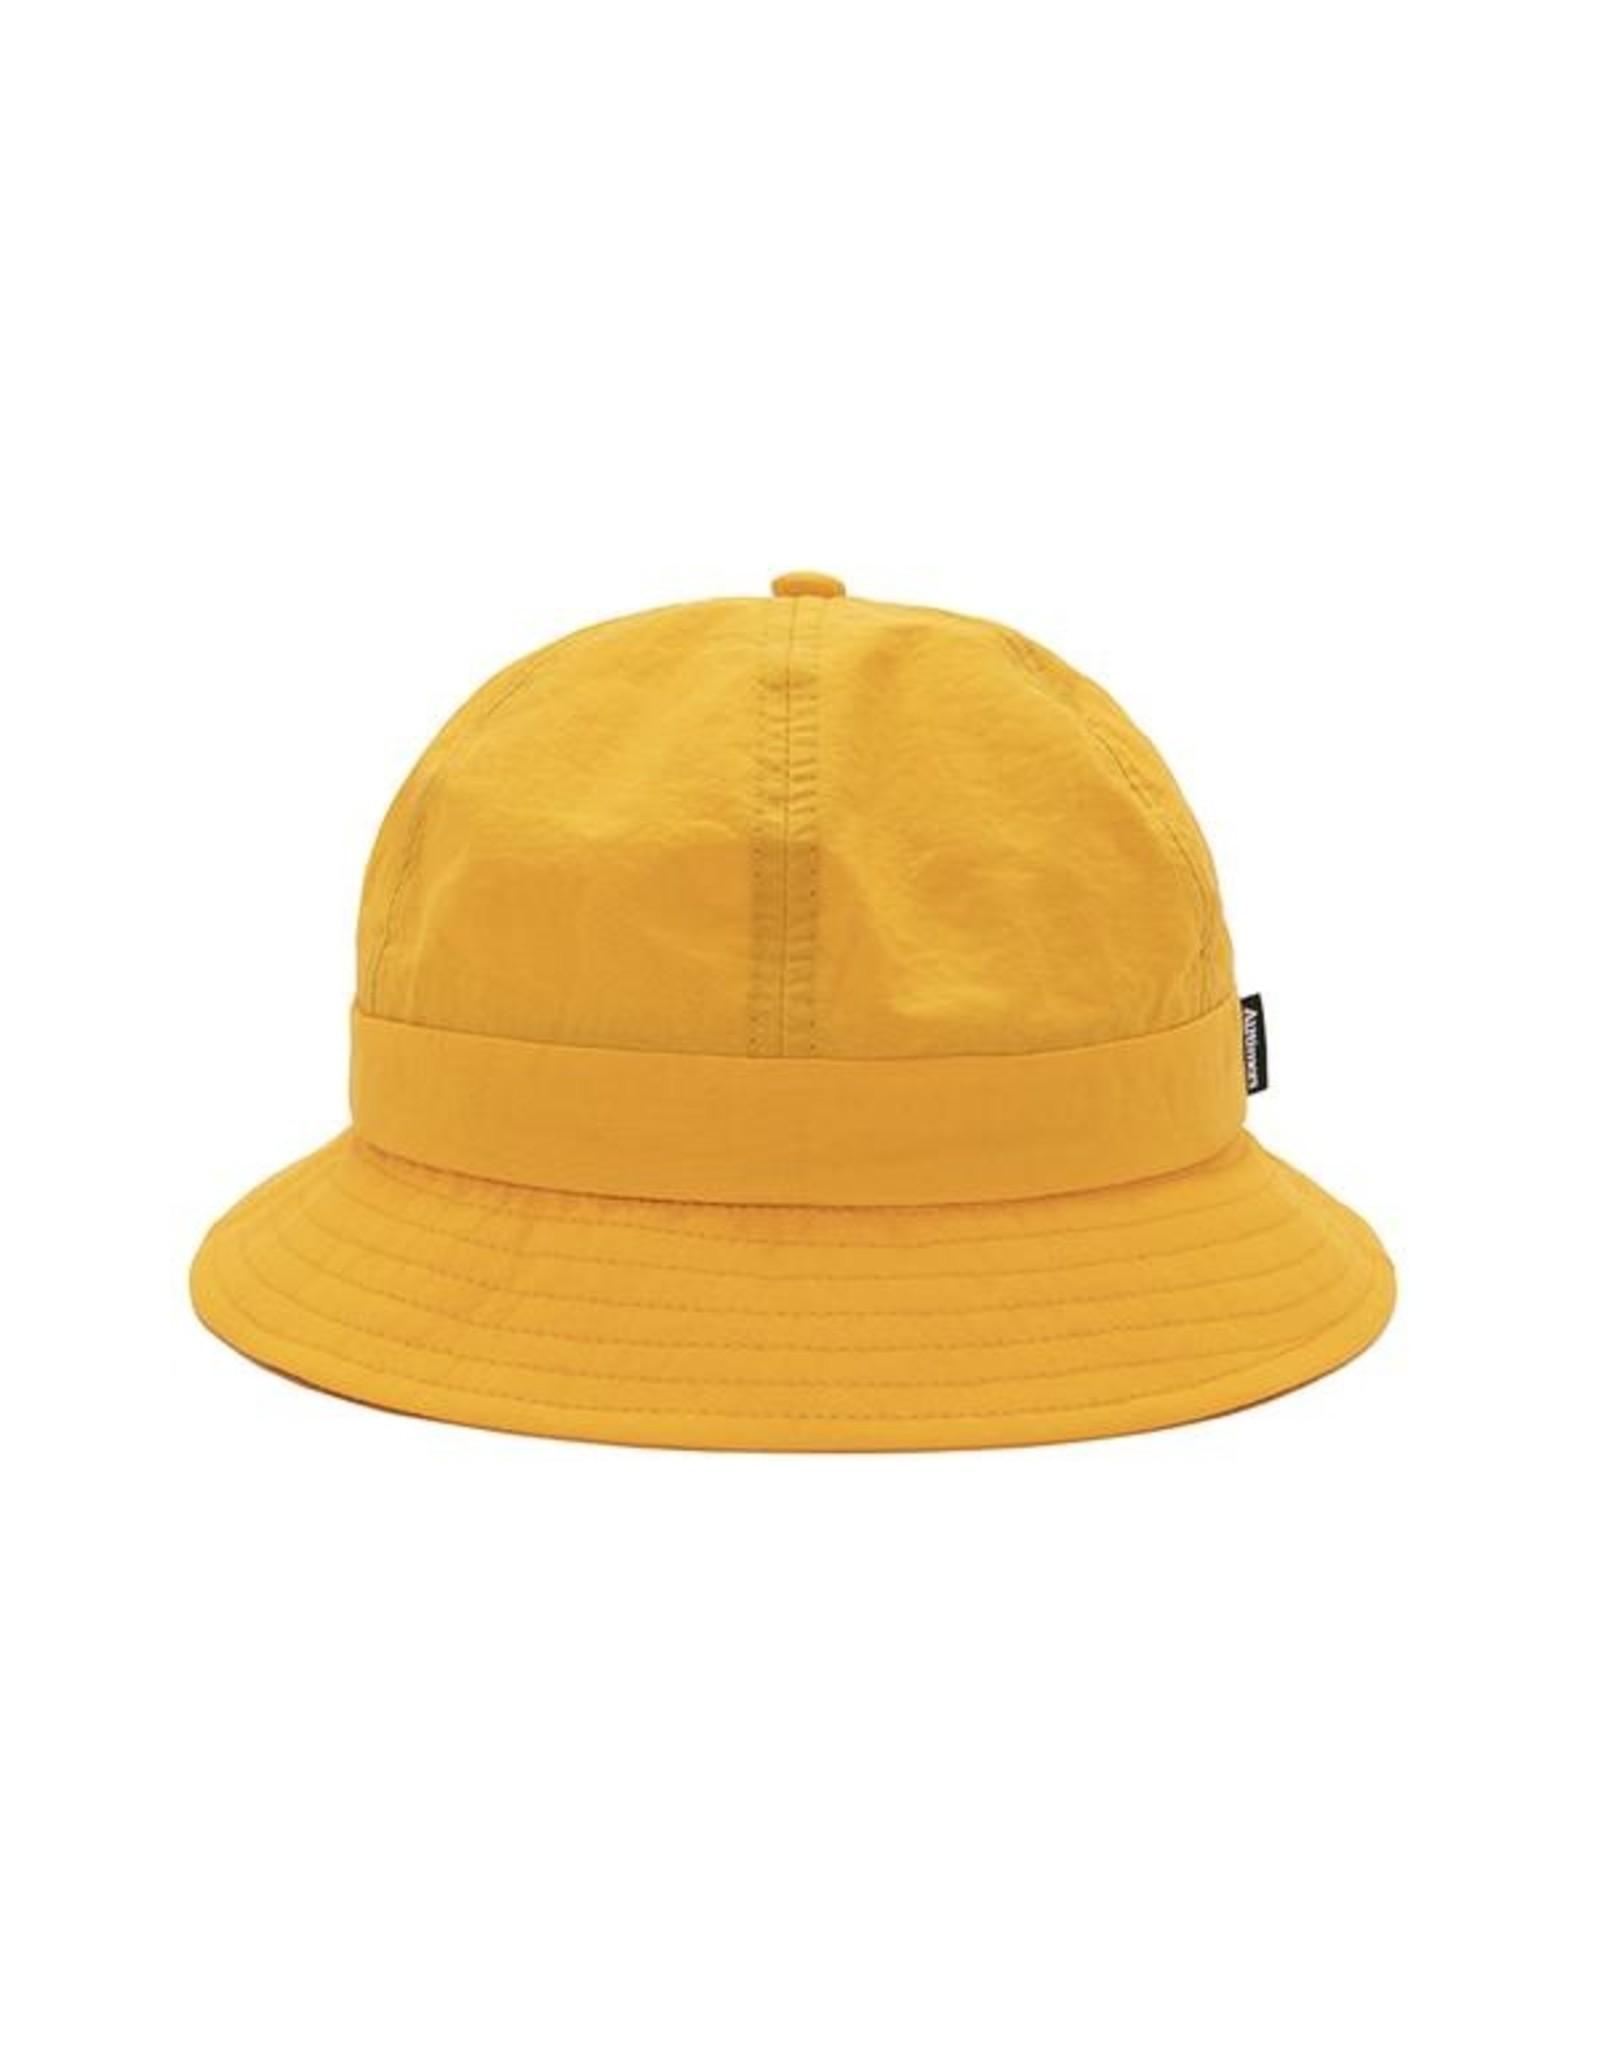 ALLTIMERS SKATEBOARD DECKS ALLTIMERS - BROADWAY BUCKET HAT - MANGO